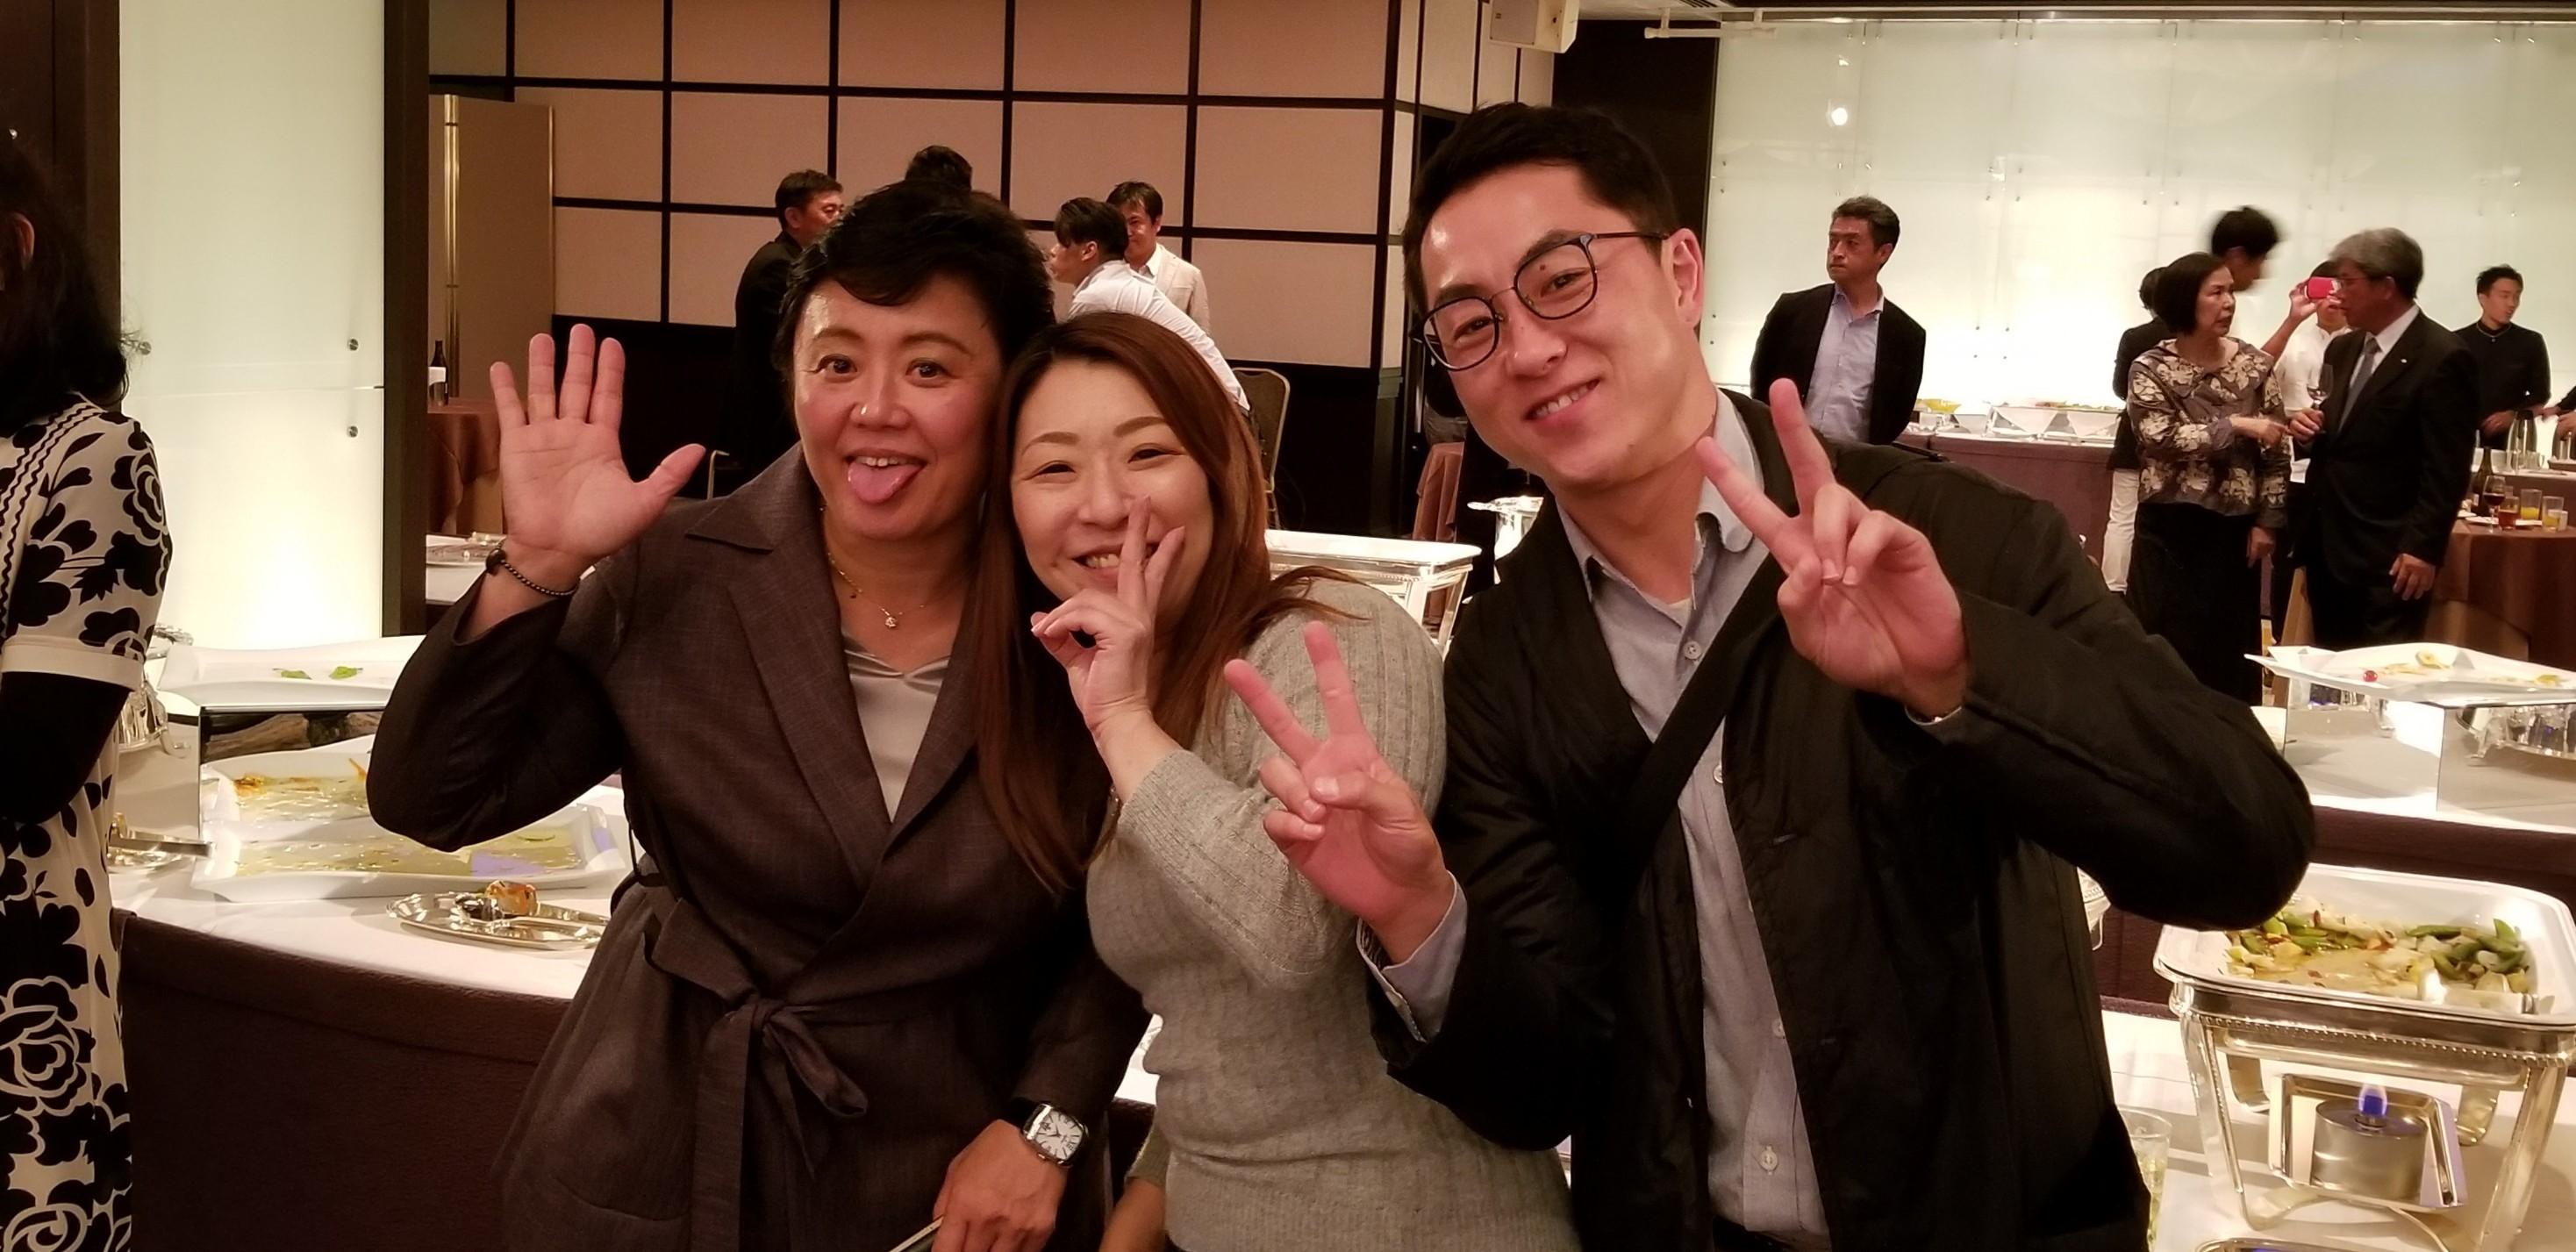 fcc11825833384746cd621b0c3bb4ad2 - 第6回思風会全国大会2018in東京開催